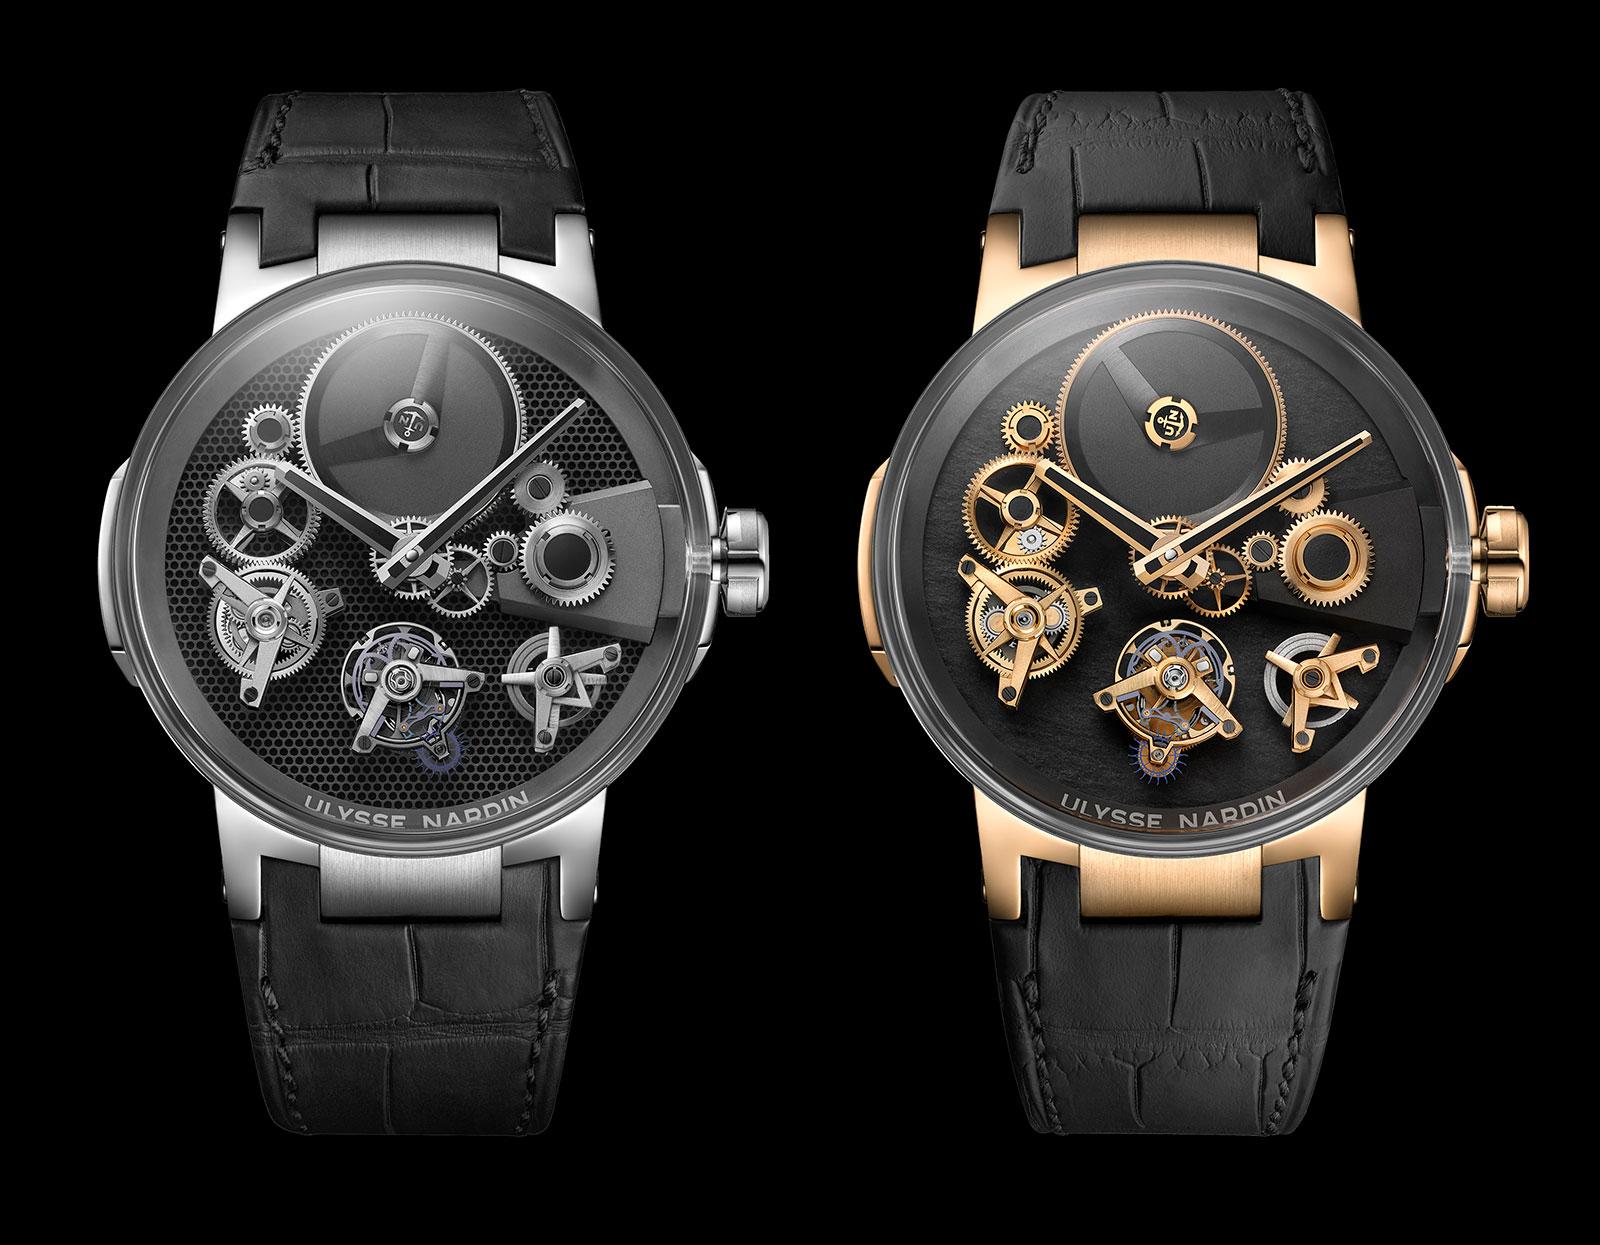 Ulysse-Nardin-Executive-Tourbillon-Free-Wheel watch 4